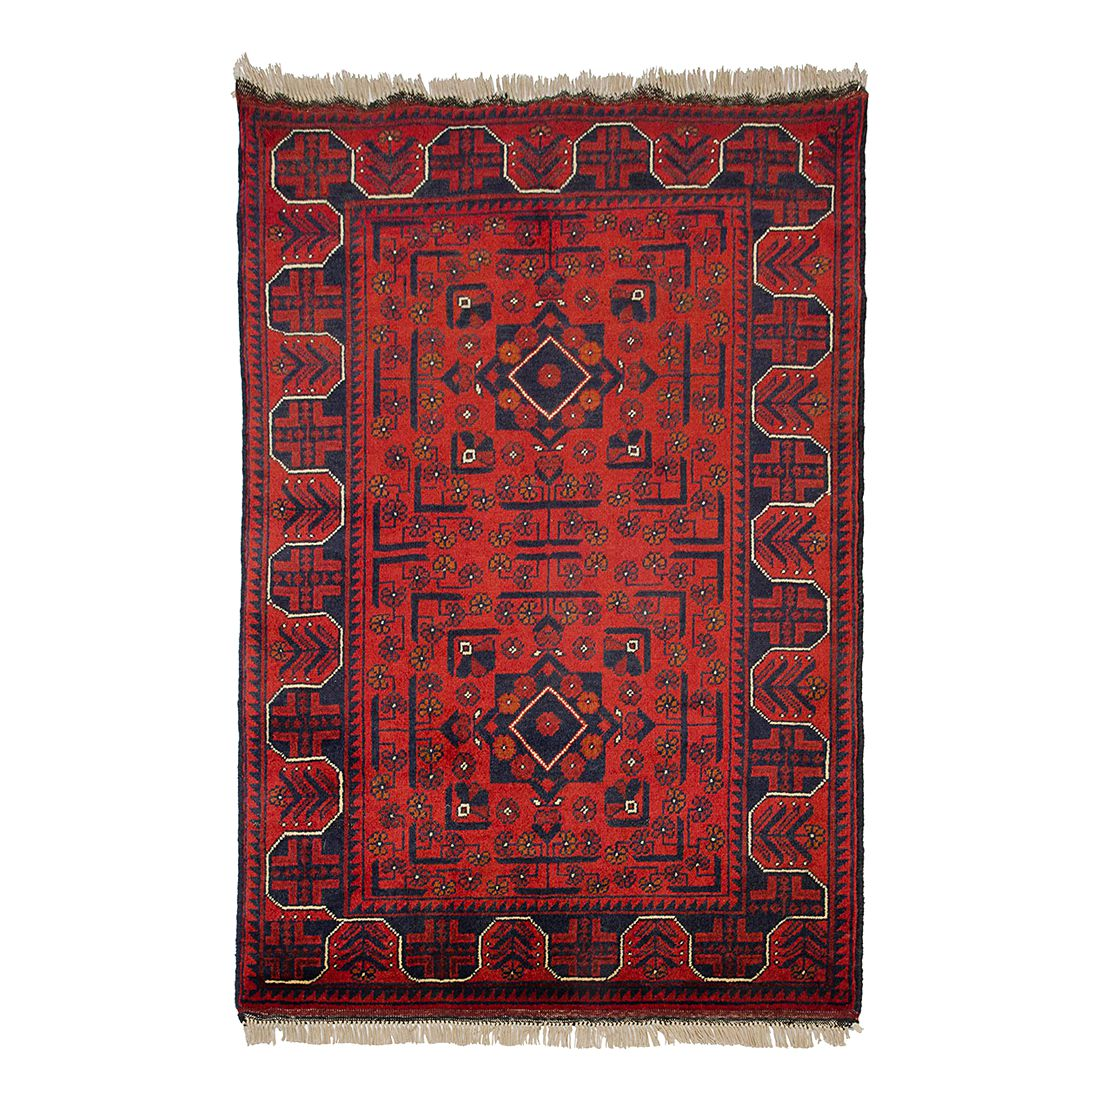 Teppich Afghan Khal Mohammadi – Rot – 80 x 120 cm, Parwis jetzt bestellen